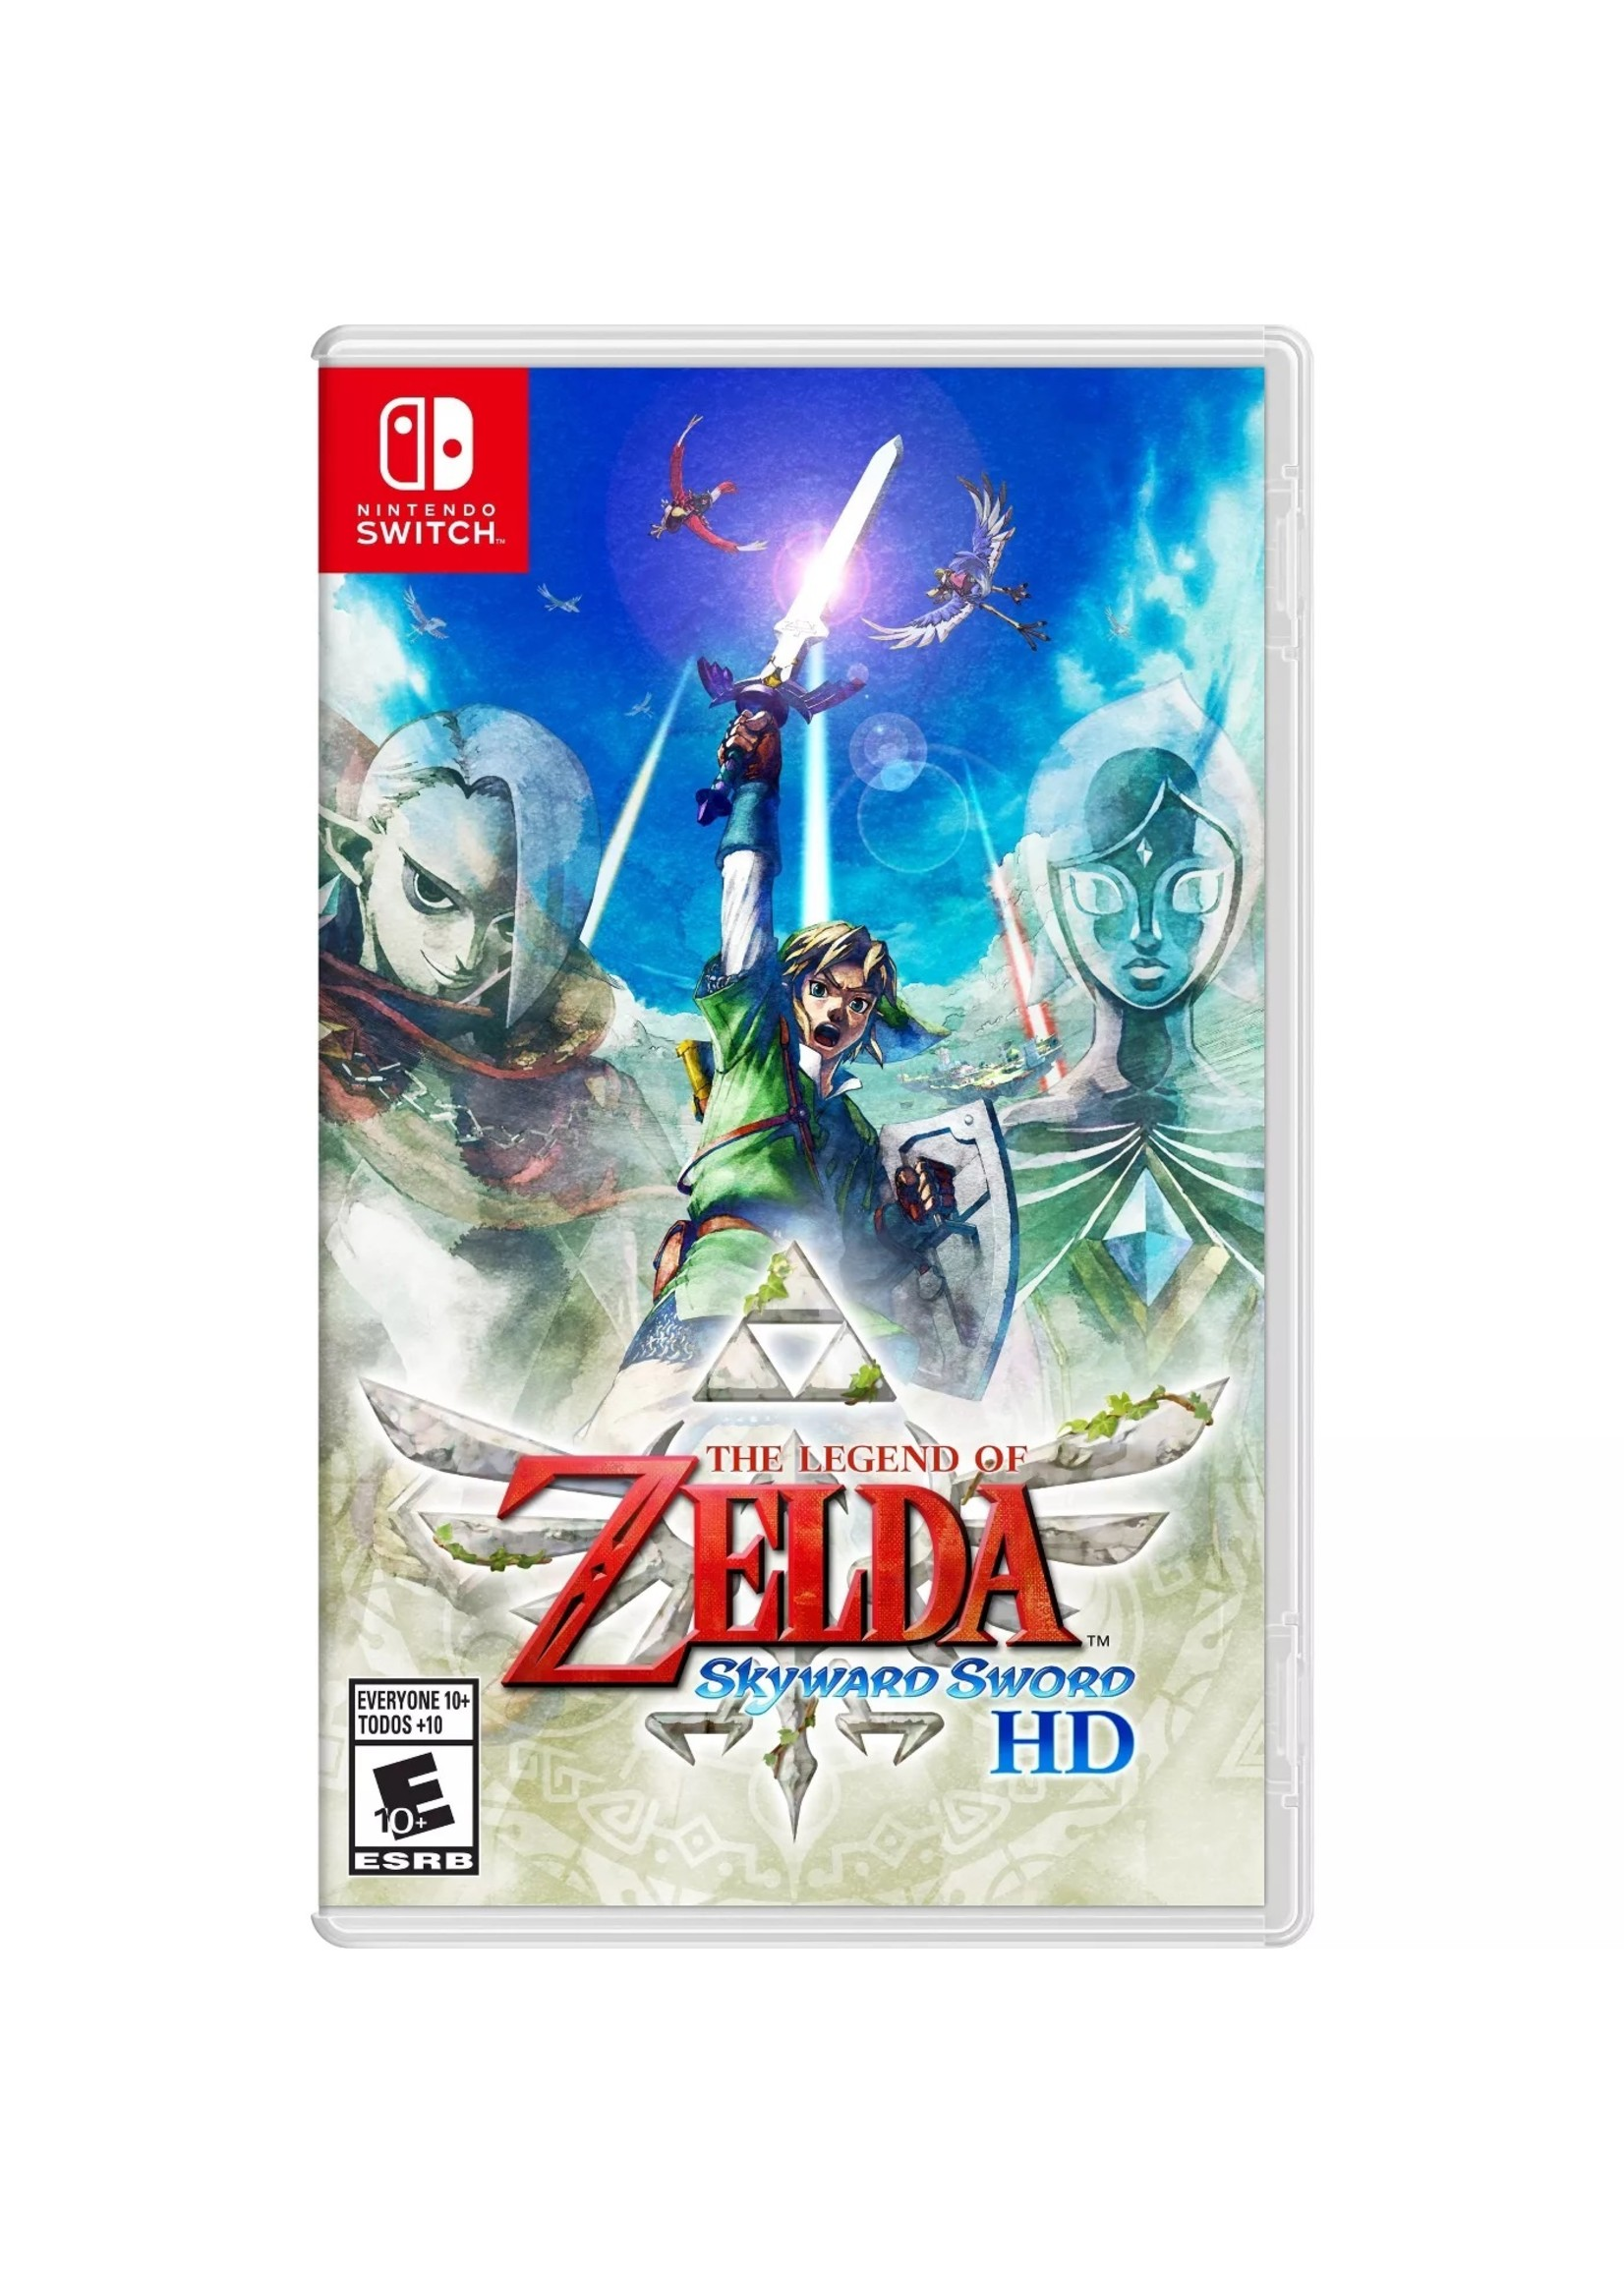 The Legend of Zelda: Skyward Sword HD - SWITCH NEW